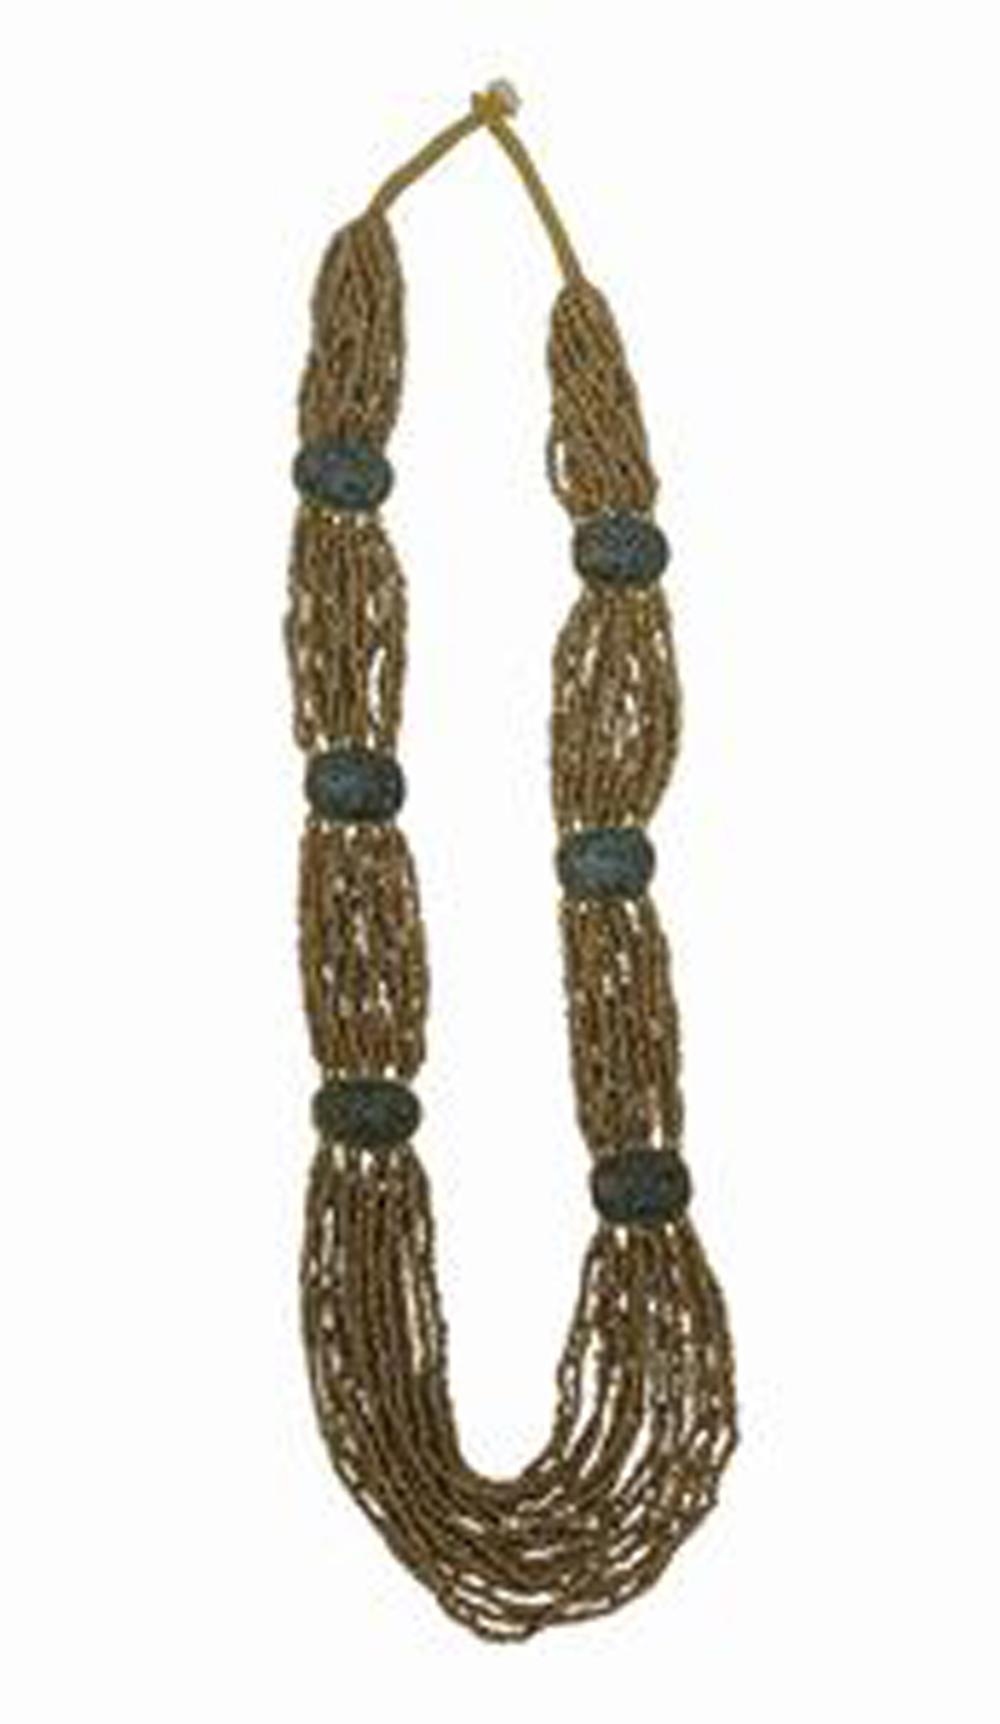 Tibetan Naga Tribal Necklace (Gold)